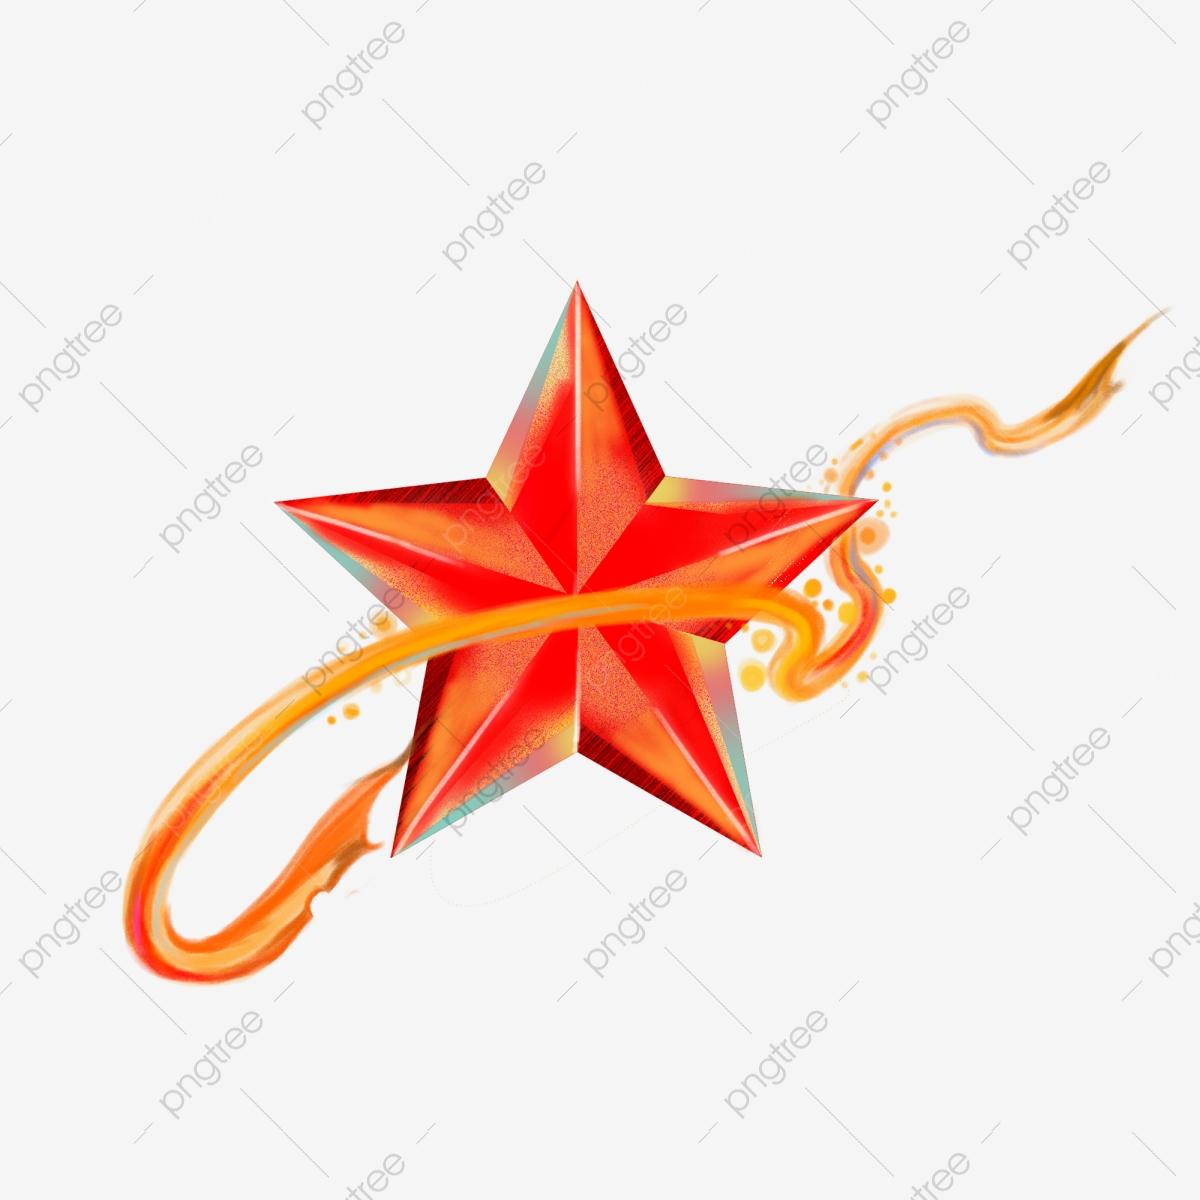 Estrella Roja, Estrella Roja, Estrella De Cinco Puntas, Rojo Archivo.